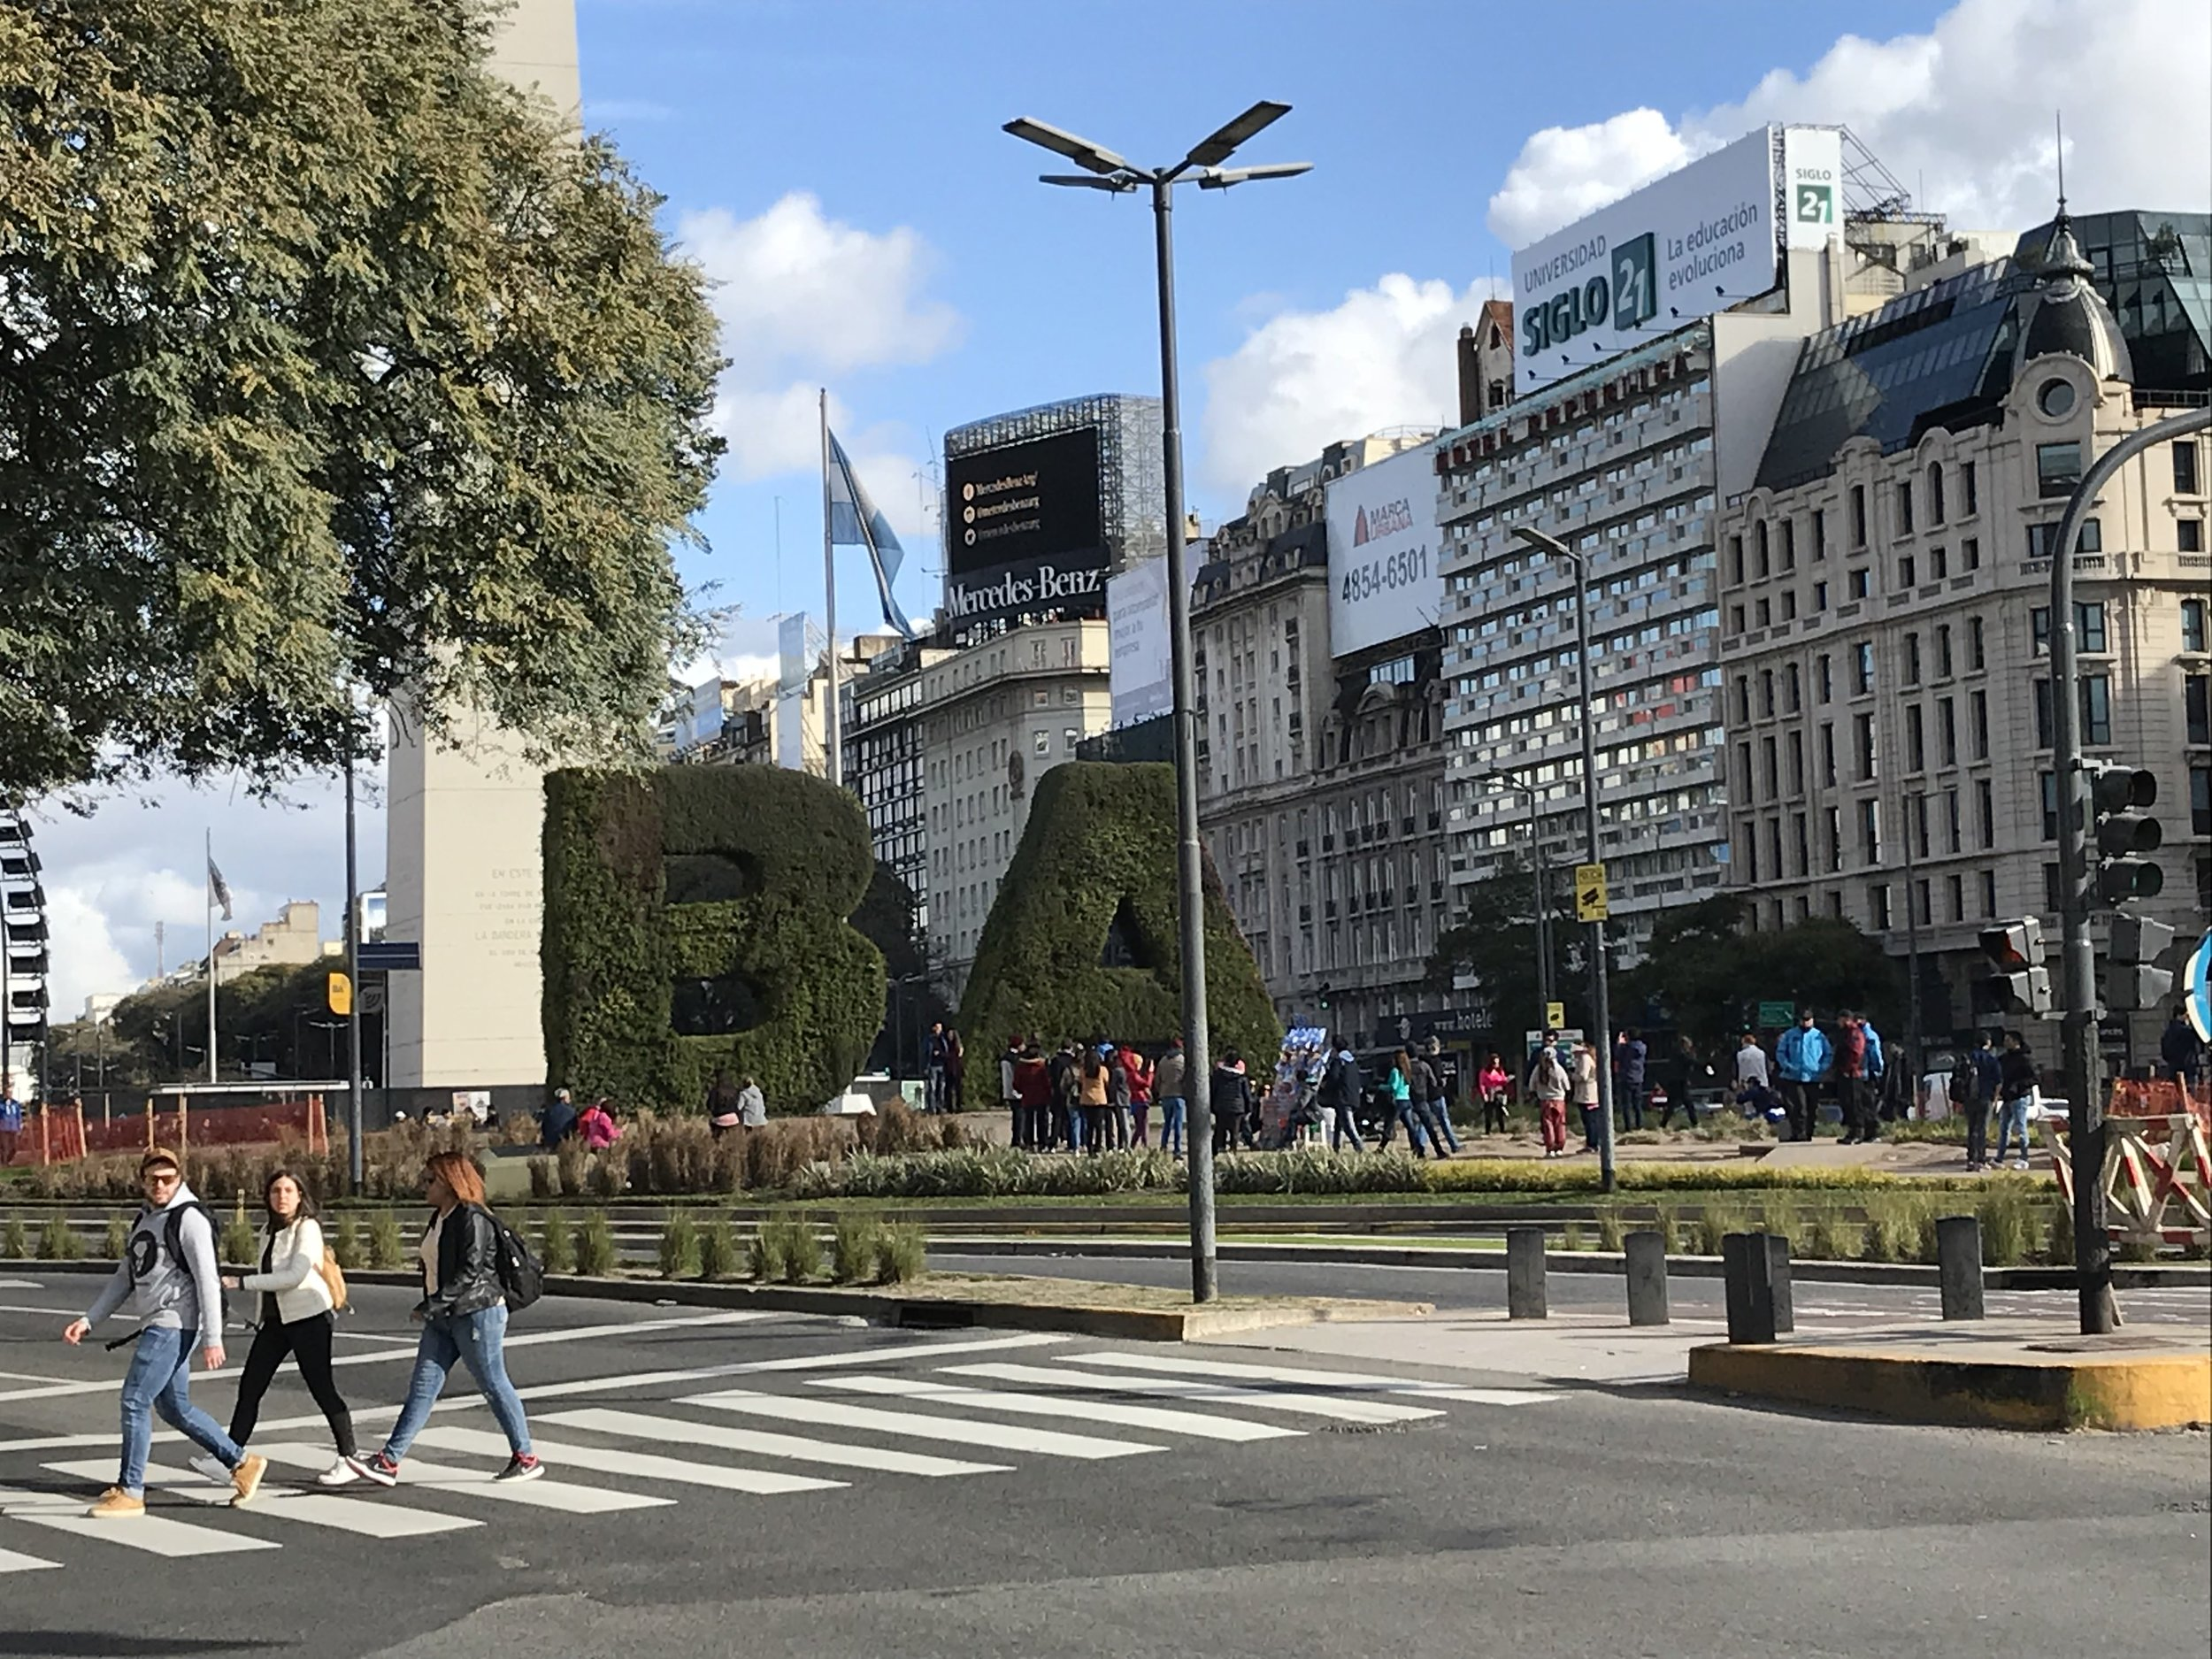 Pretty Buenos Aires.